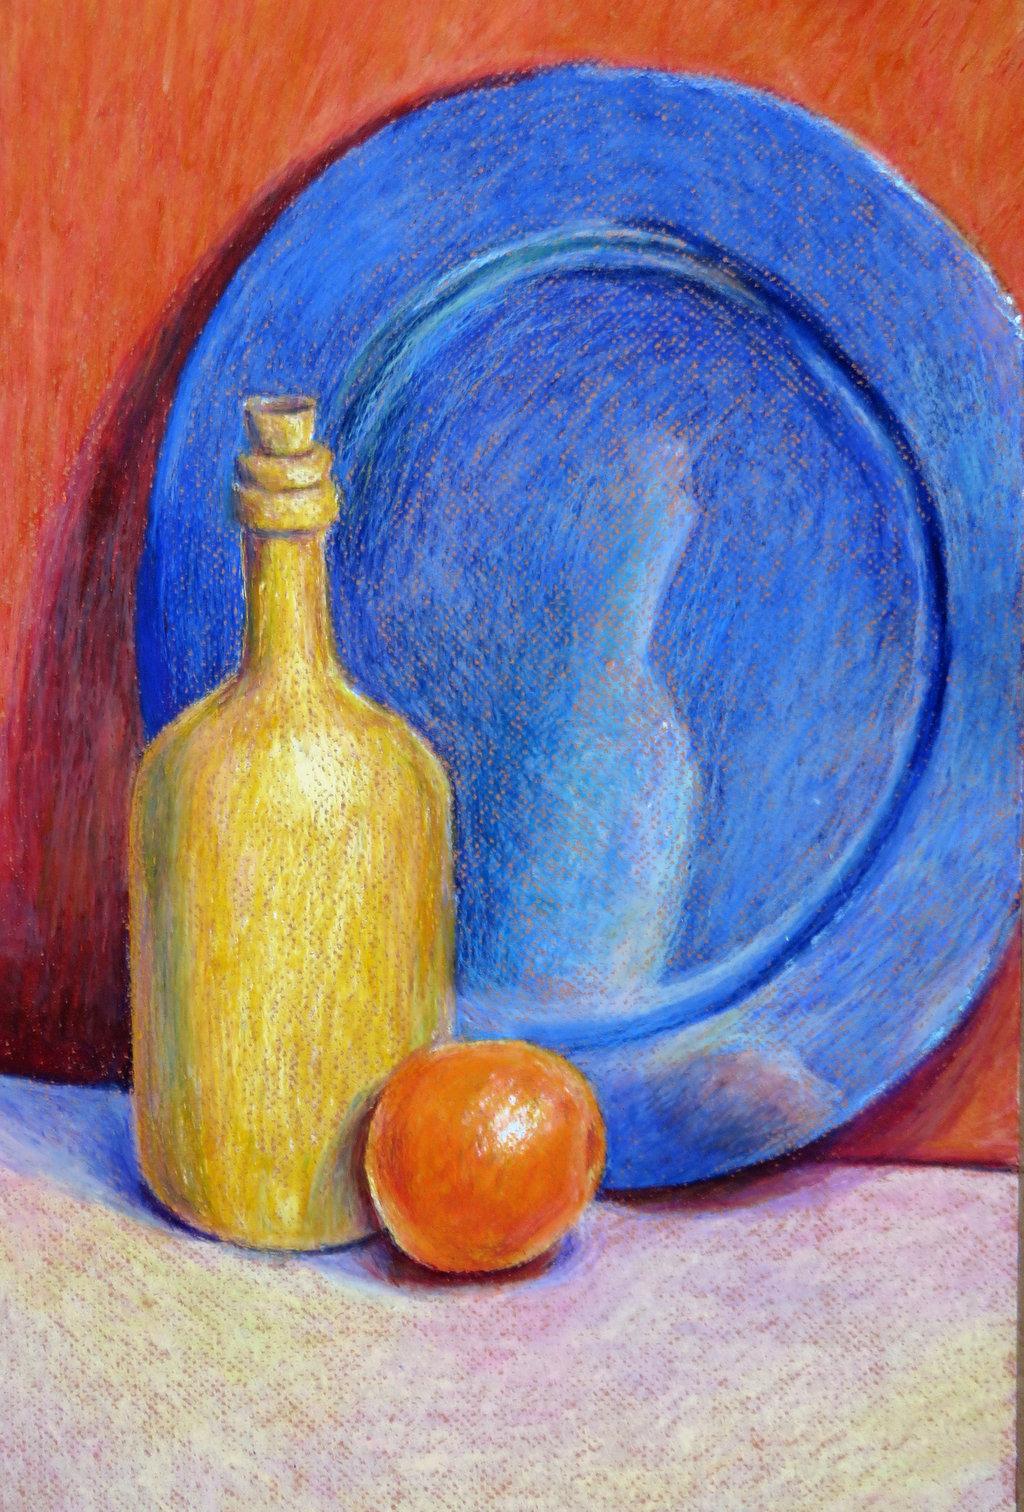 Drawn still life oil pastel Oil on by fourdasherette fourdasherette